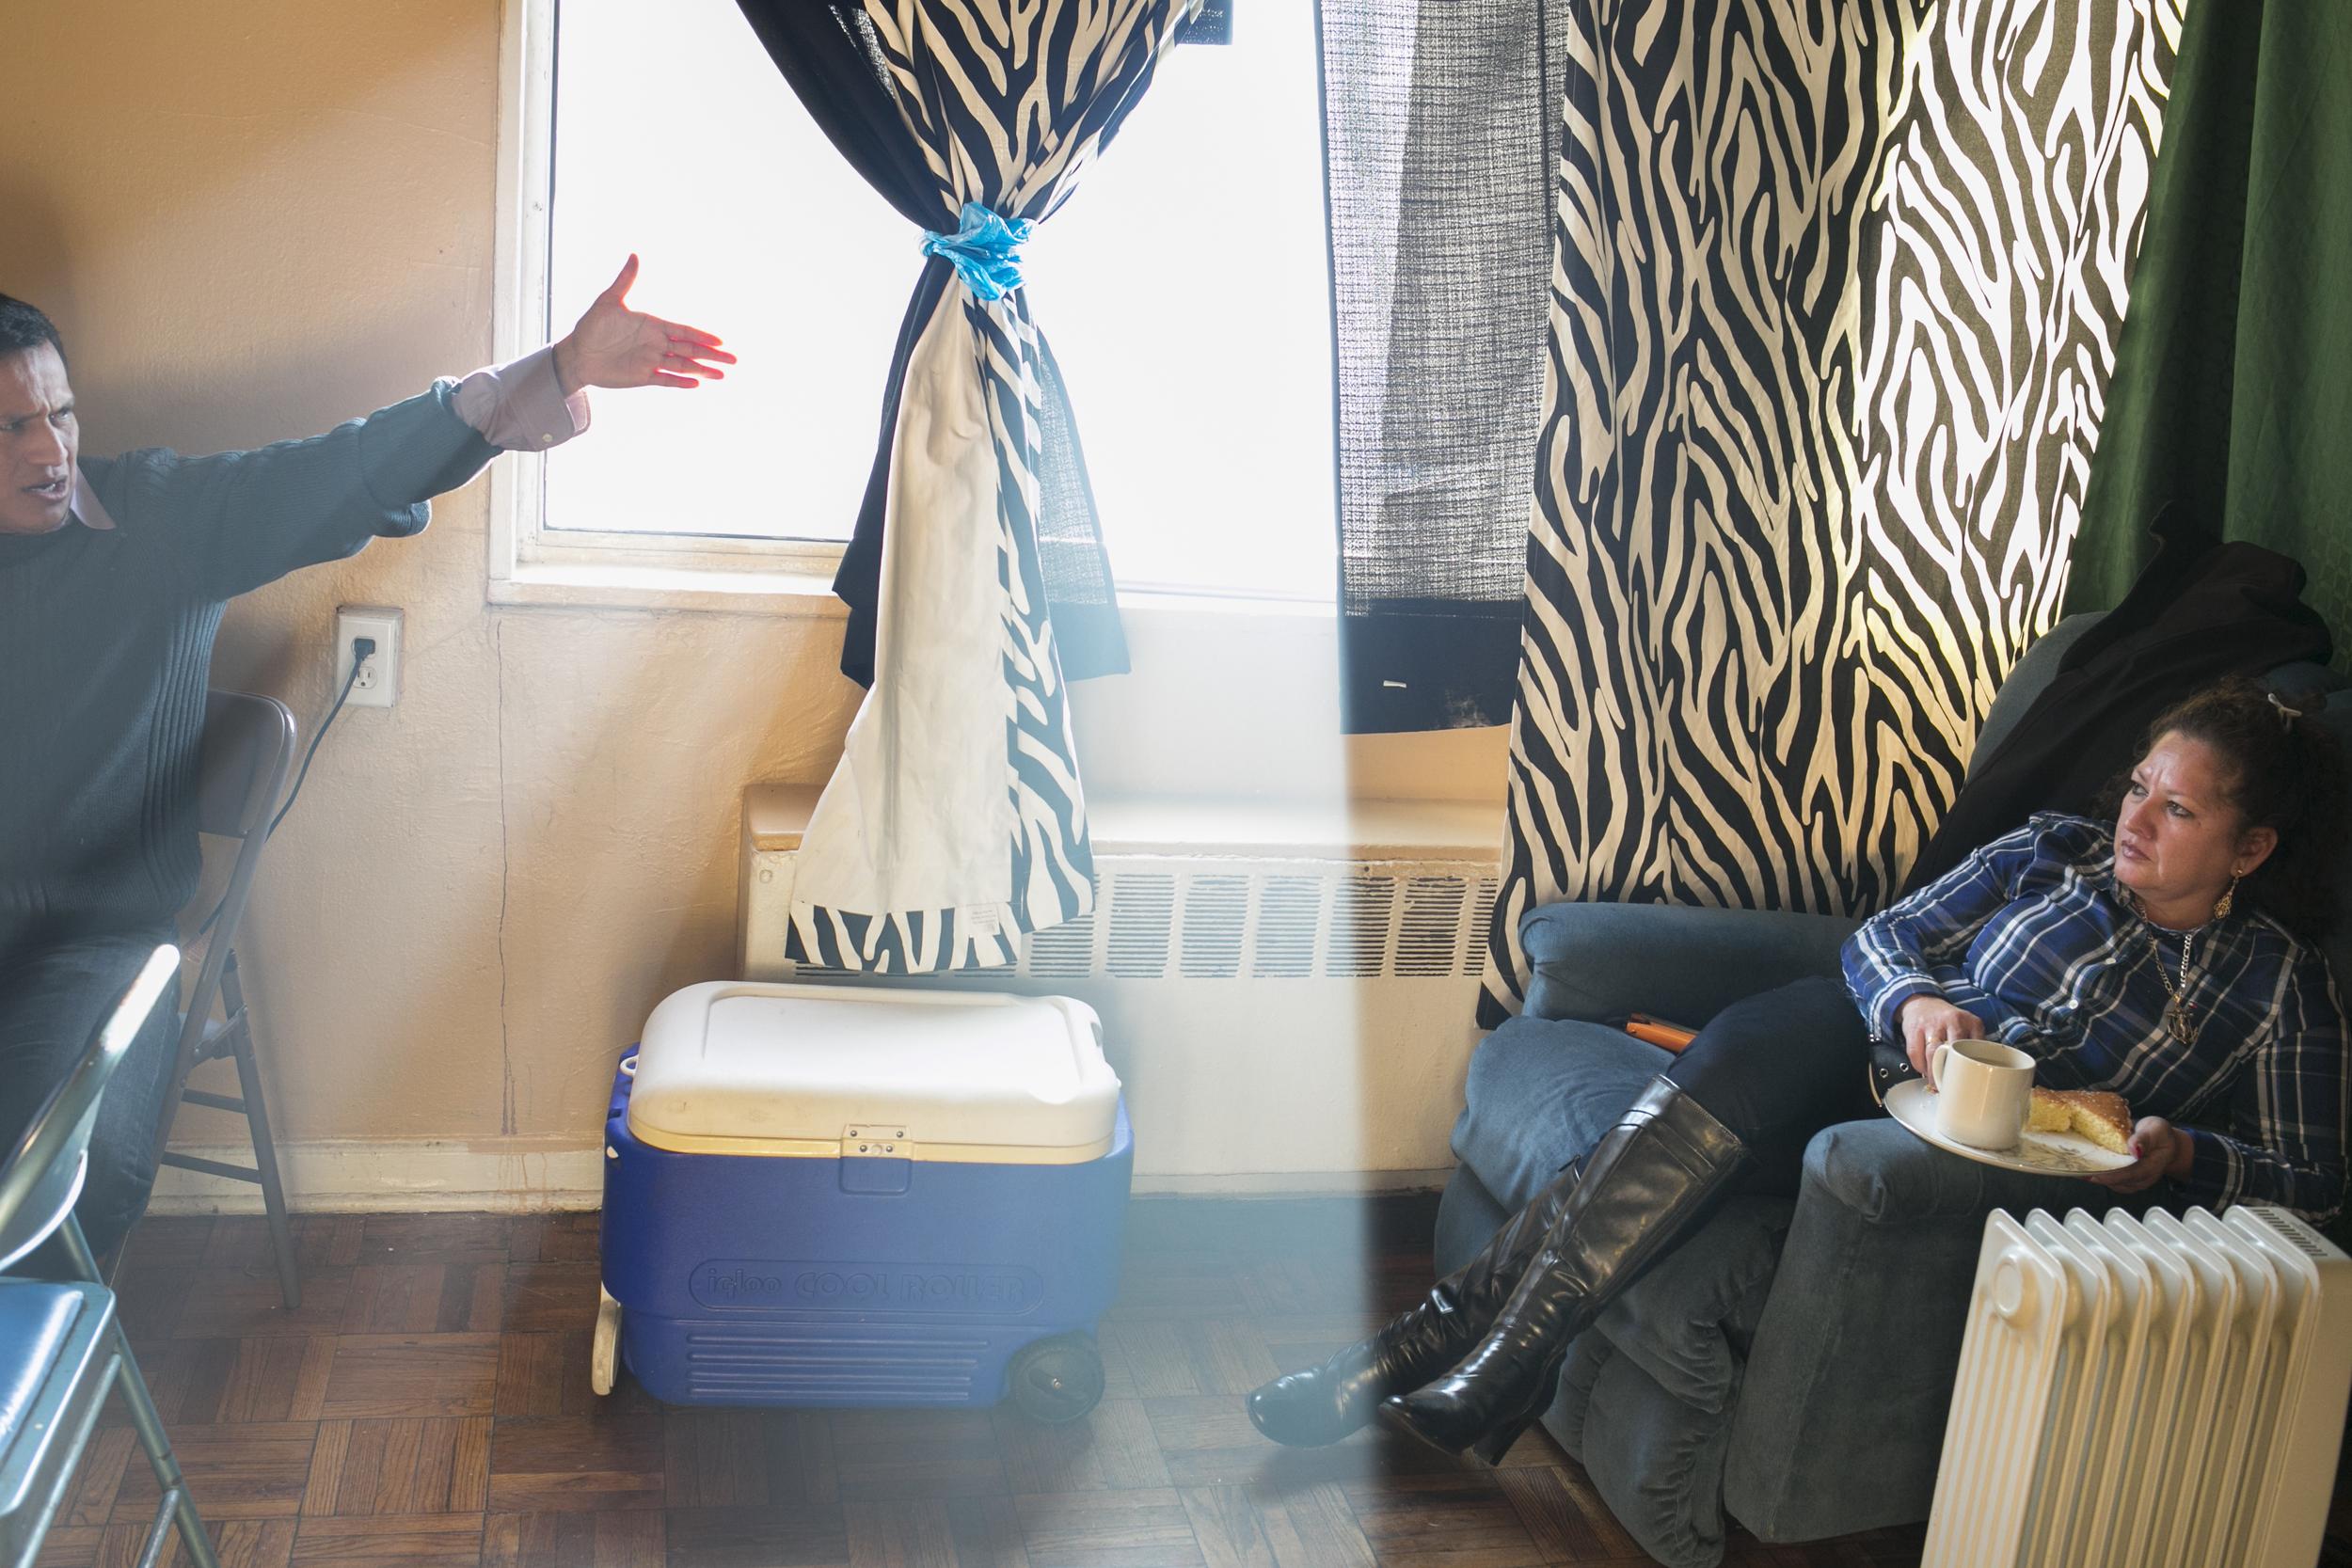 Marina Hoya visits her husband and children in Maryland.